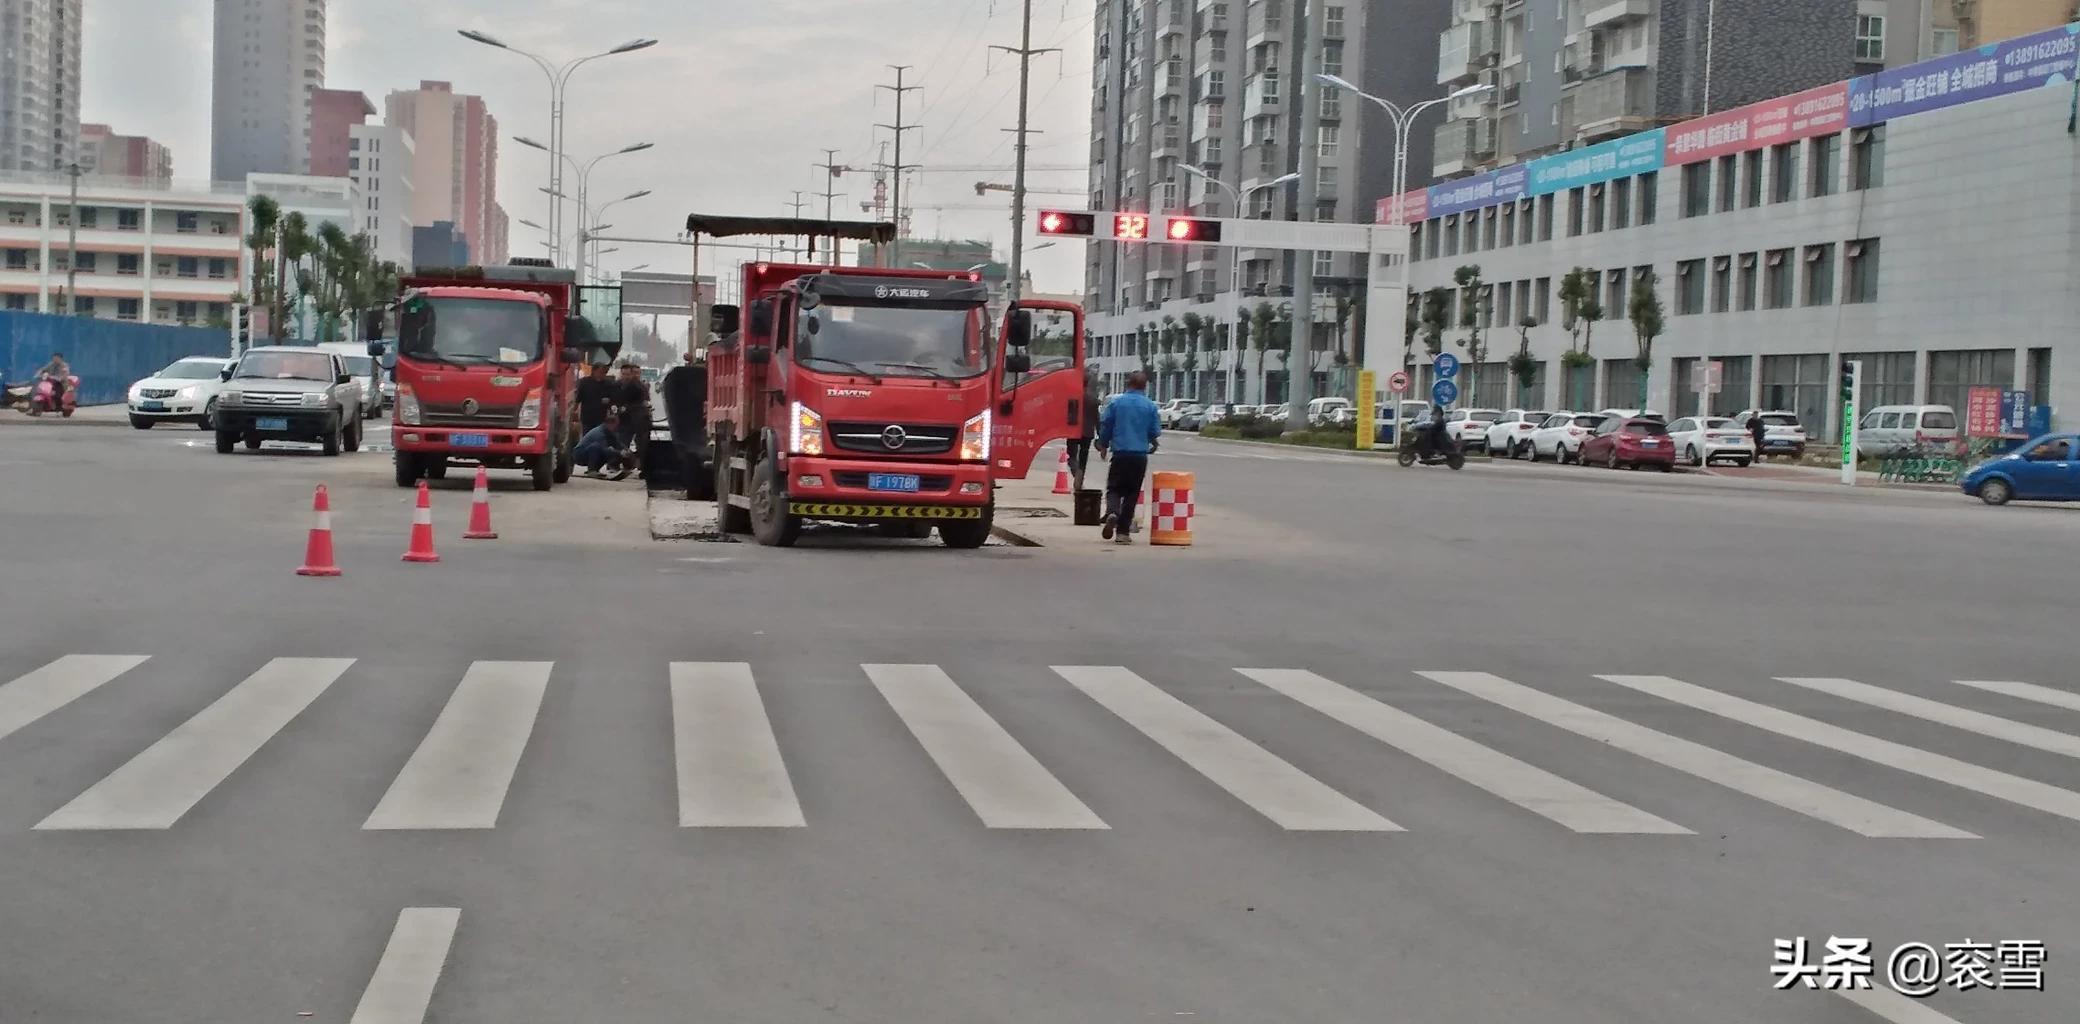 �h�_�^�h��路�c梁州路十字路口,正在施工中